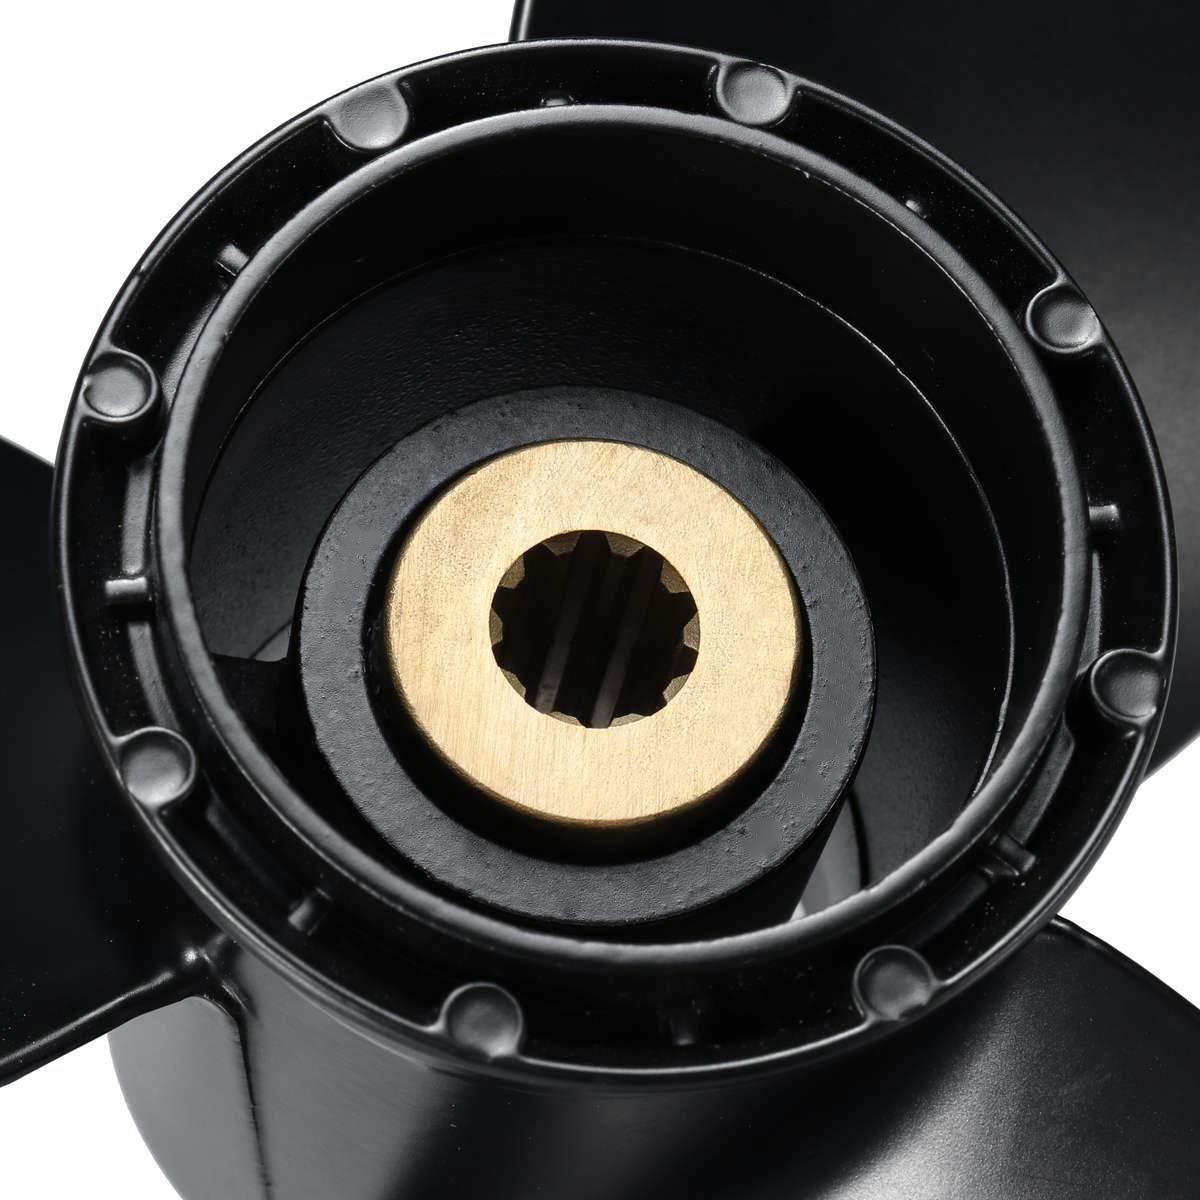 CUHAWUDBA Schiffs Motor Au?en Border Propeller Aluminium Legierung 3 Blatt Drehfl/ügel 58100-93733-019 F/ür 8-20Hp 9 1//4 X 10